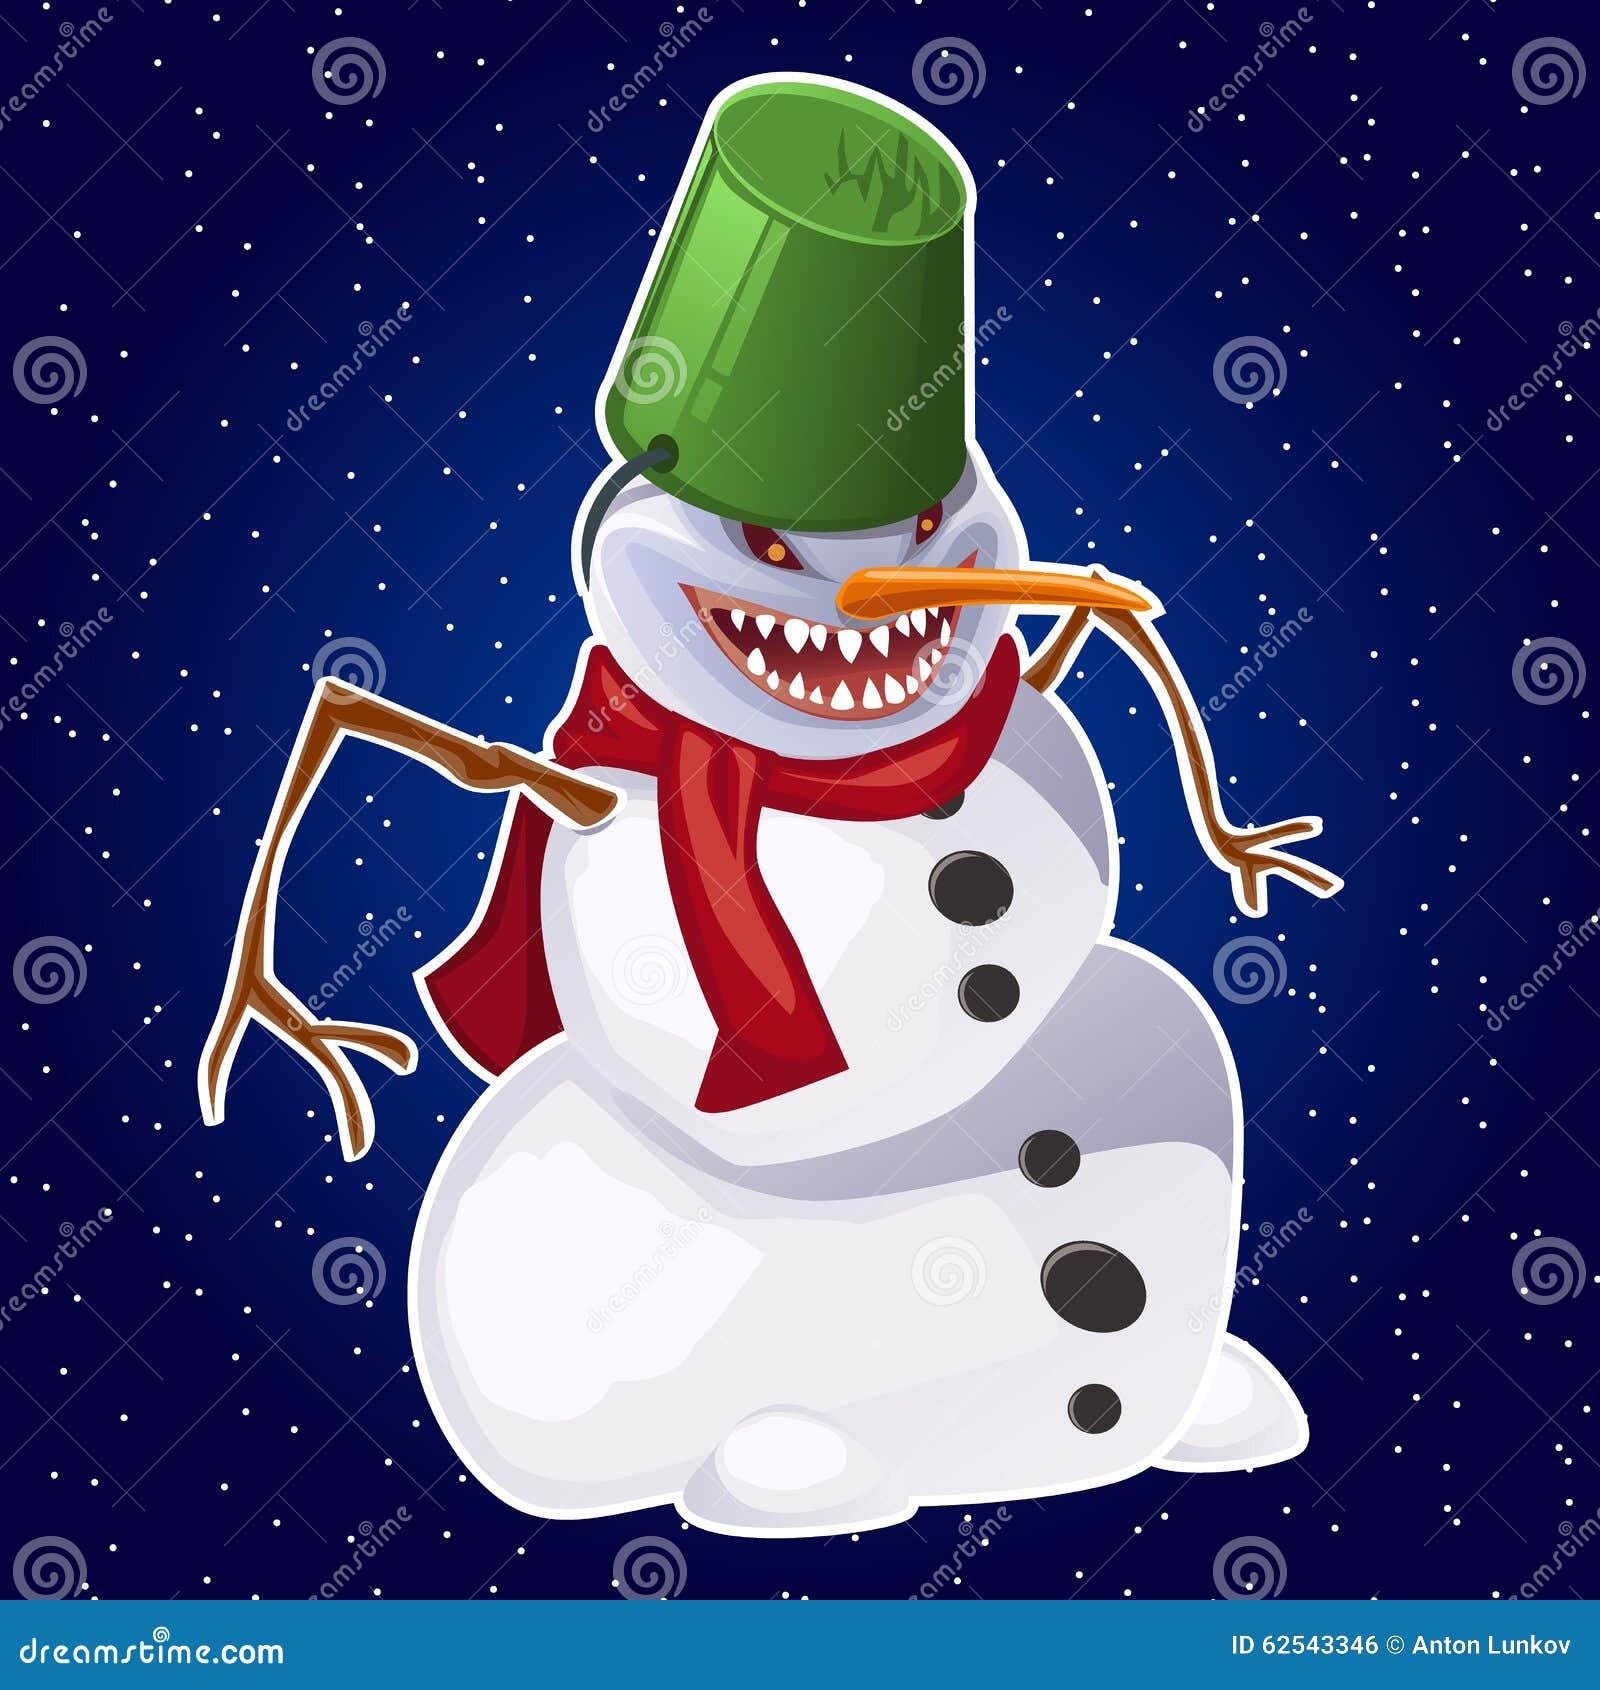 a7dd4e025e5 Evil snowman wearing carrot nose